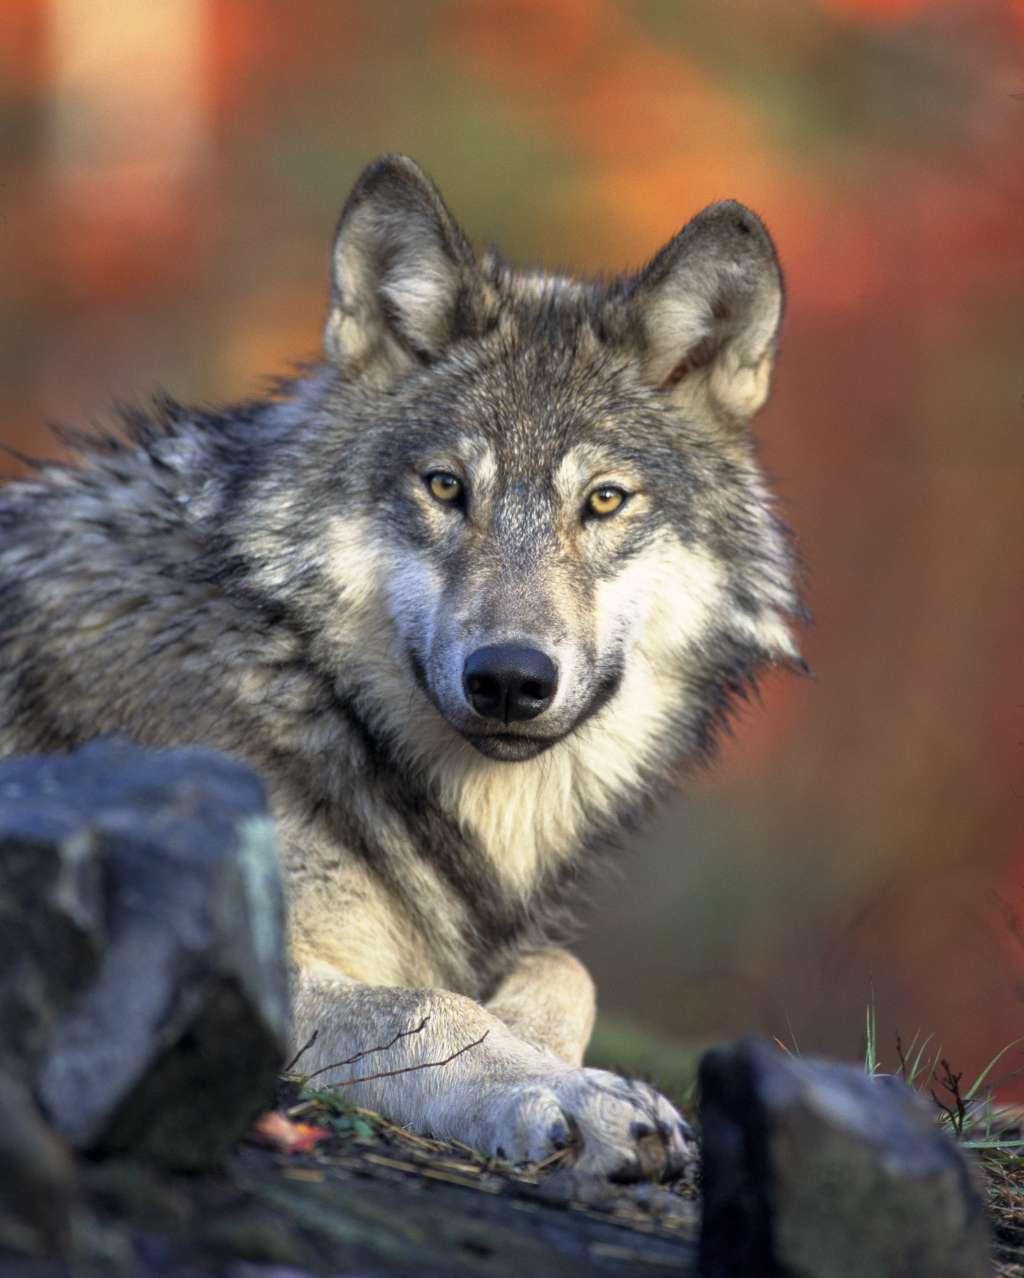 De wolf. Afbeelding: Gary Kramer / US Fish & Wildlife Service.